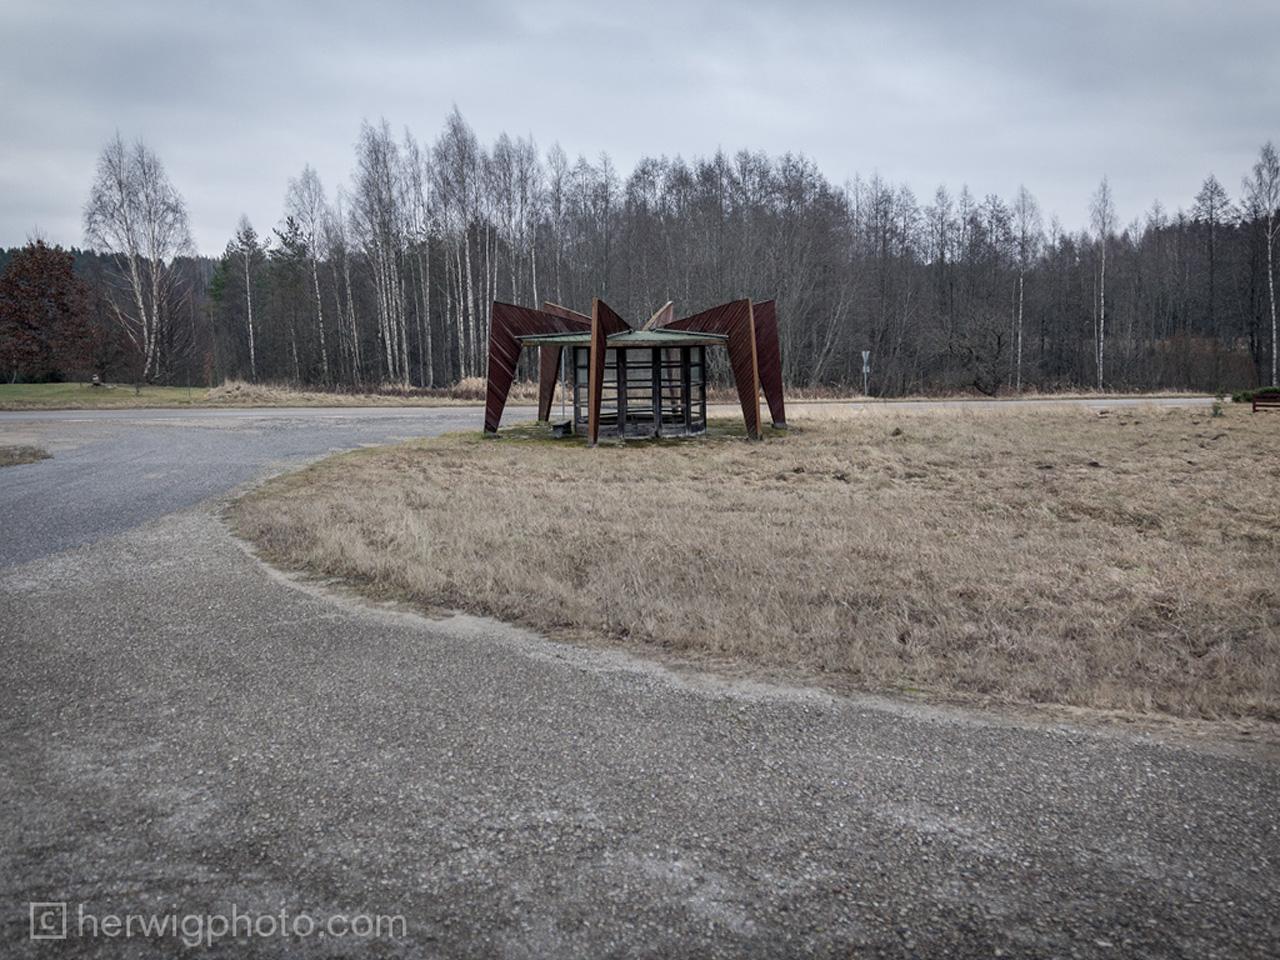 531daab7c07a806cd90002a3_a-collection-of-striking-soviet-bus-stop-designs_niitsikuestonia